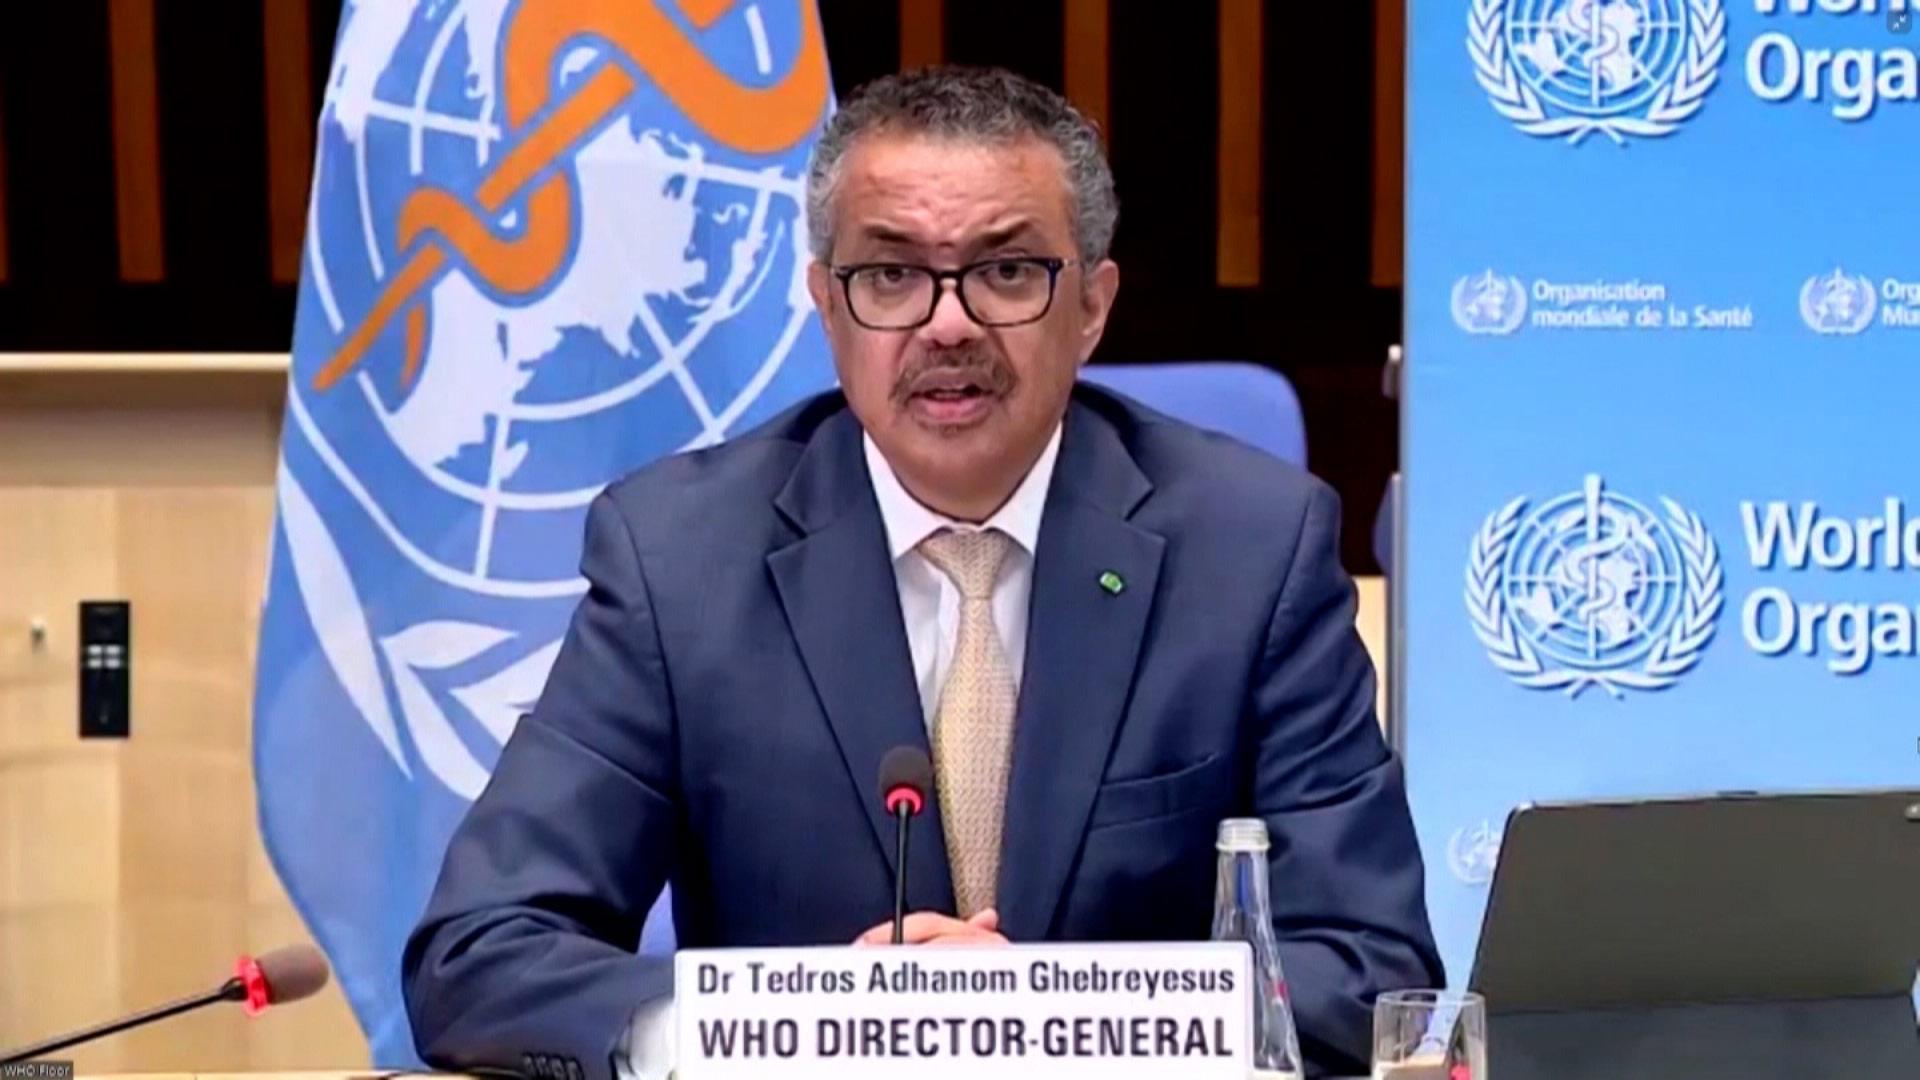 World Health Organization Director General Tedros Adhanom Ghebreyesus speaks during a press conference on Monday, March 29.